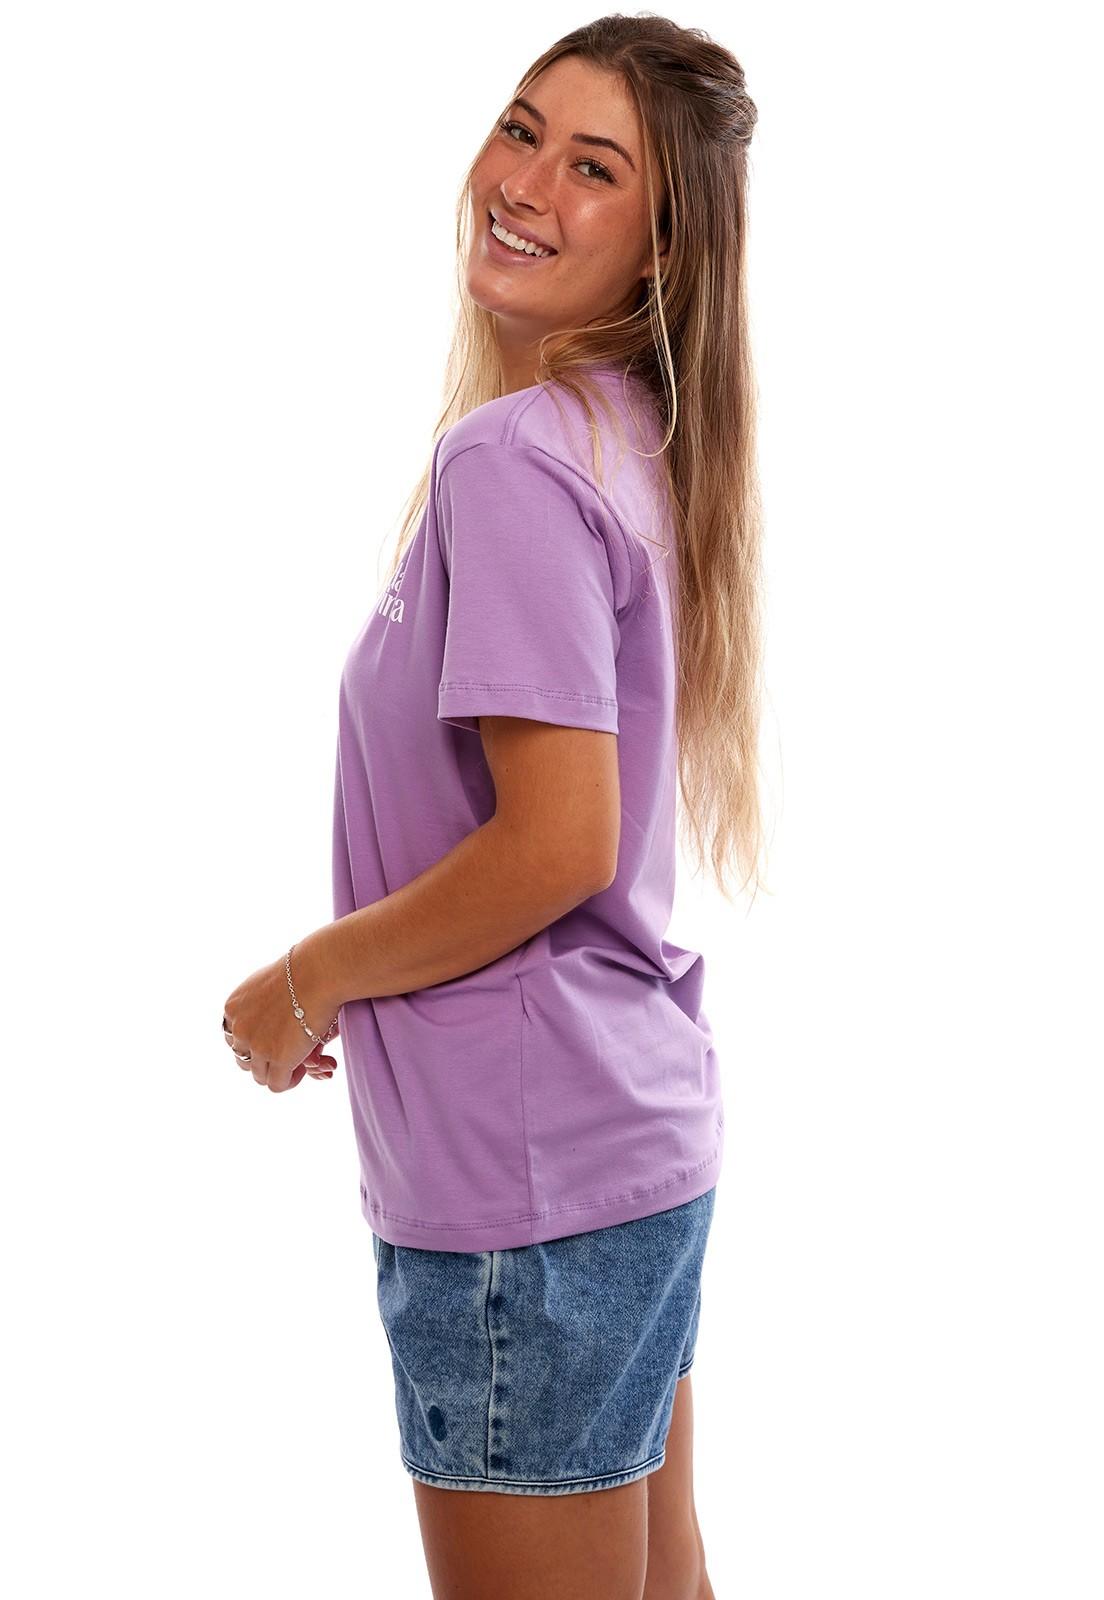 Camiseta Vida Marinha Manga Curta Lilás